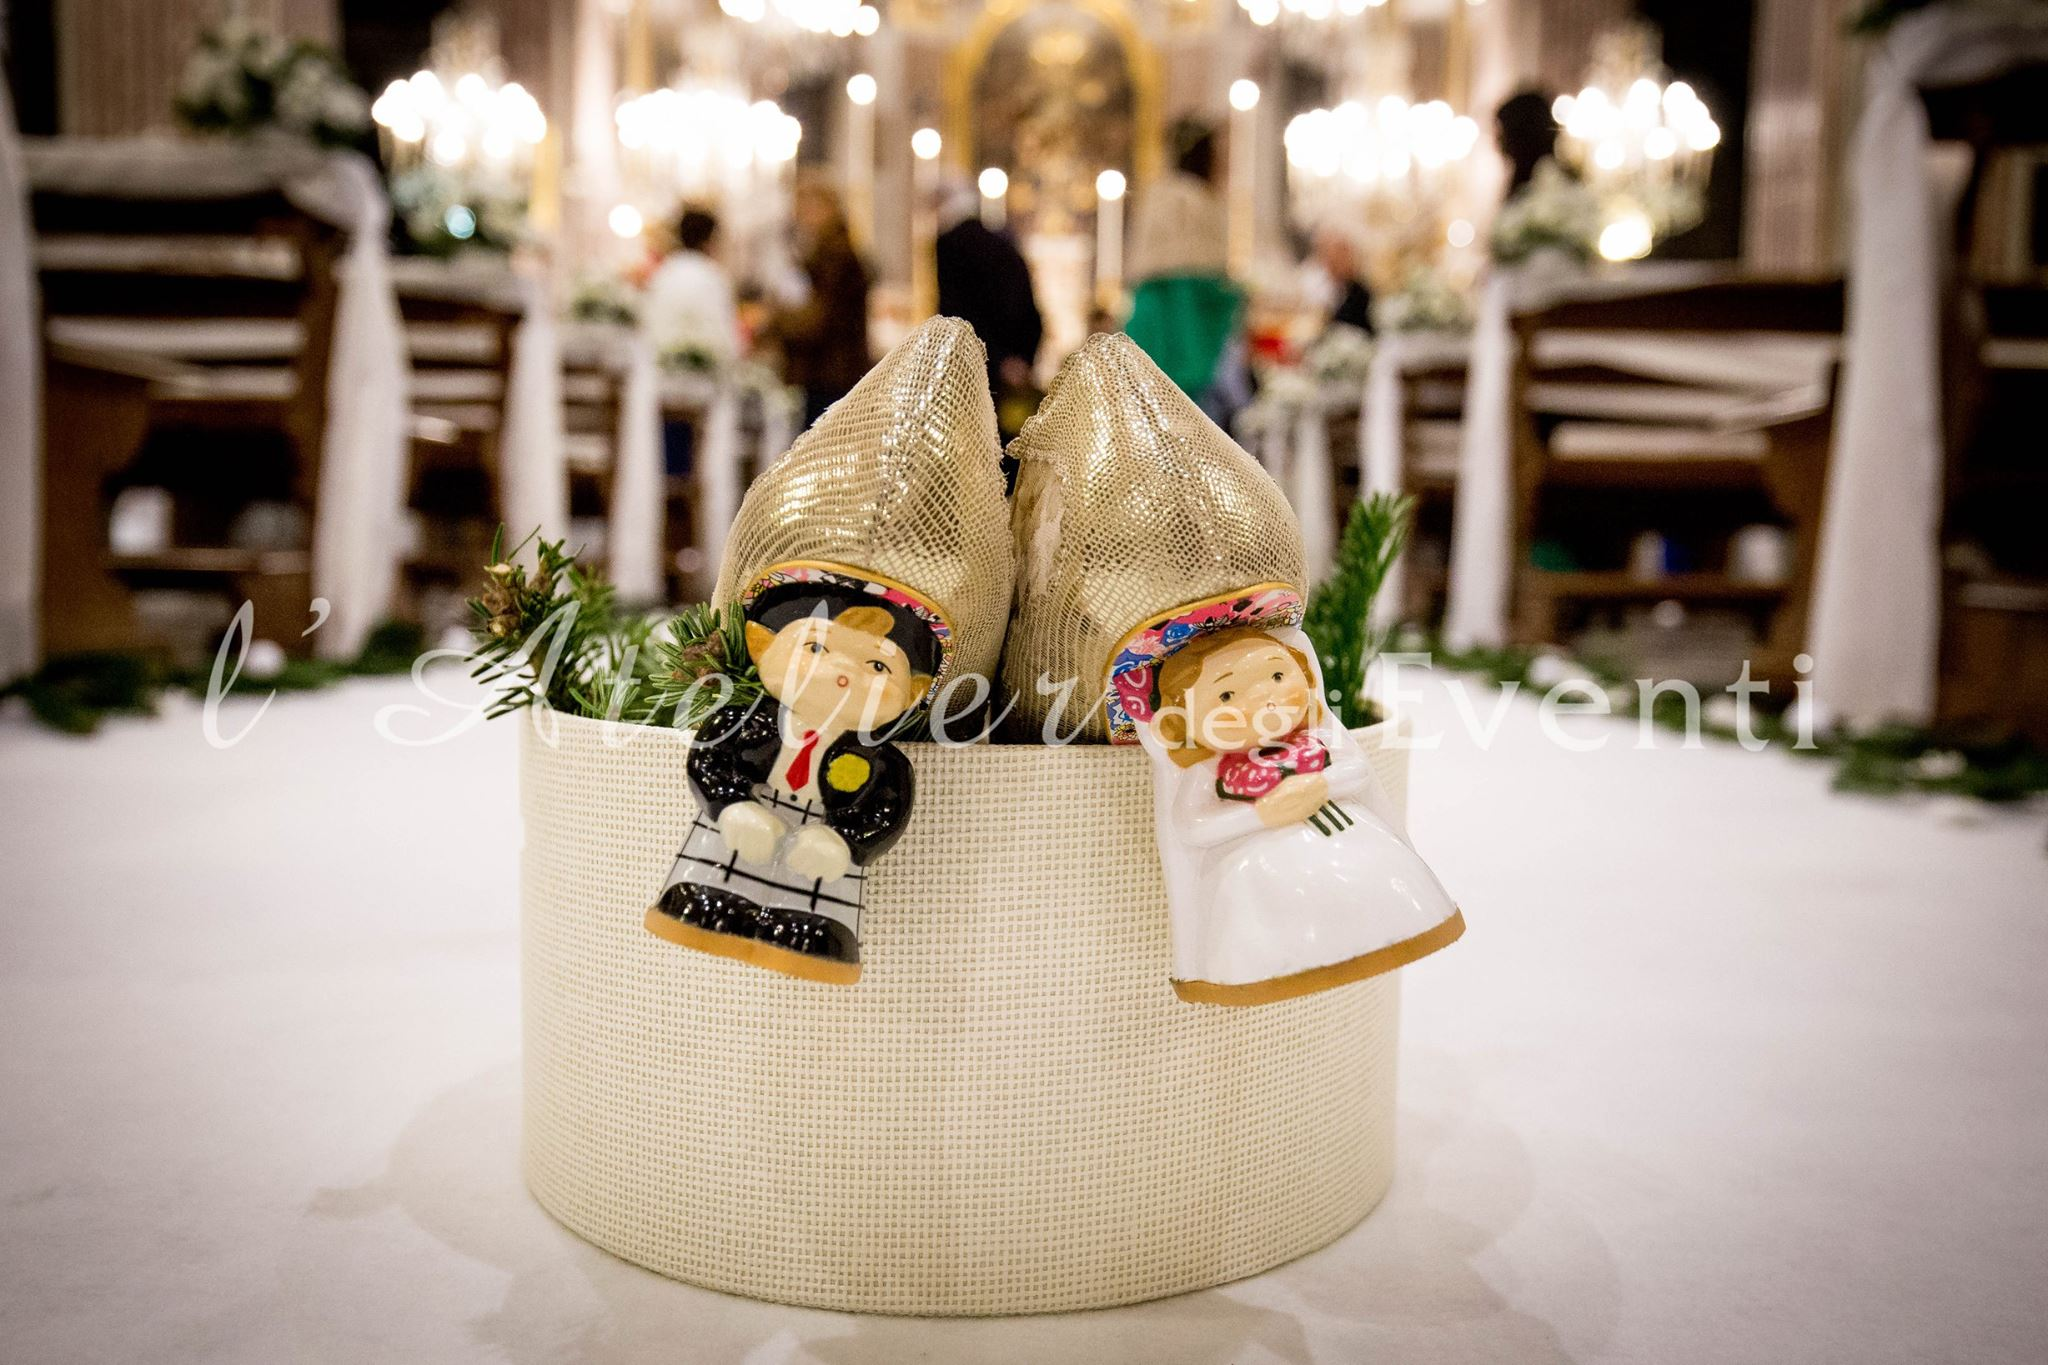 scarpe_sposa_originali_matrimonio_nozze_idee